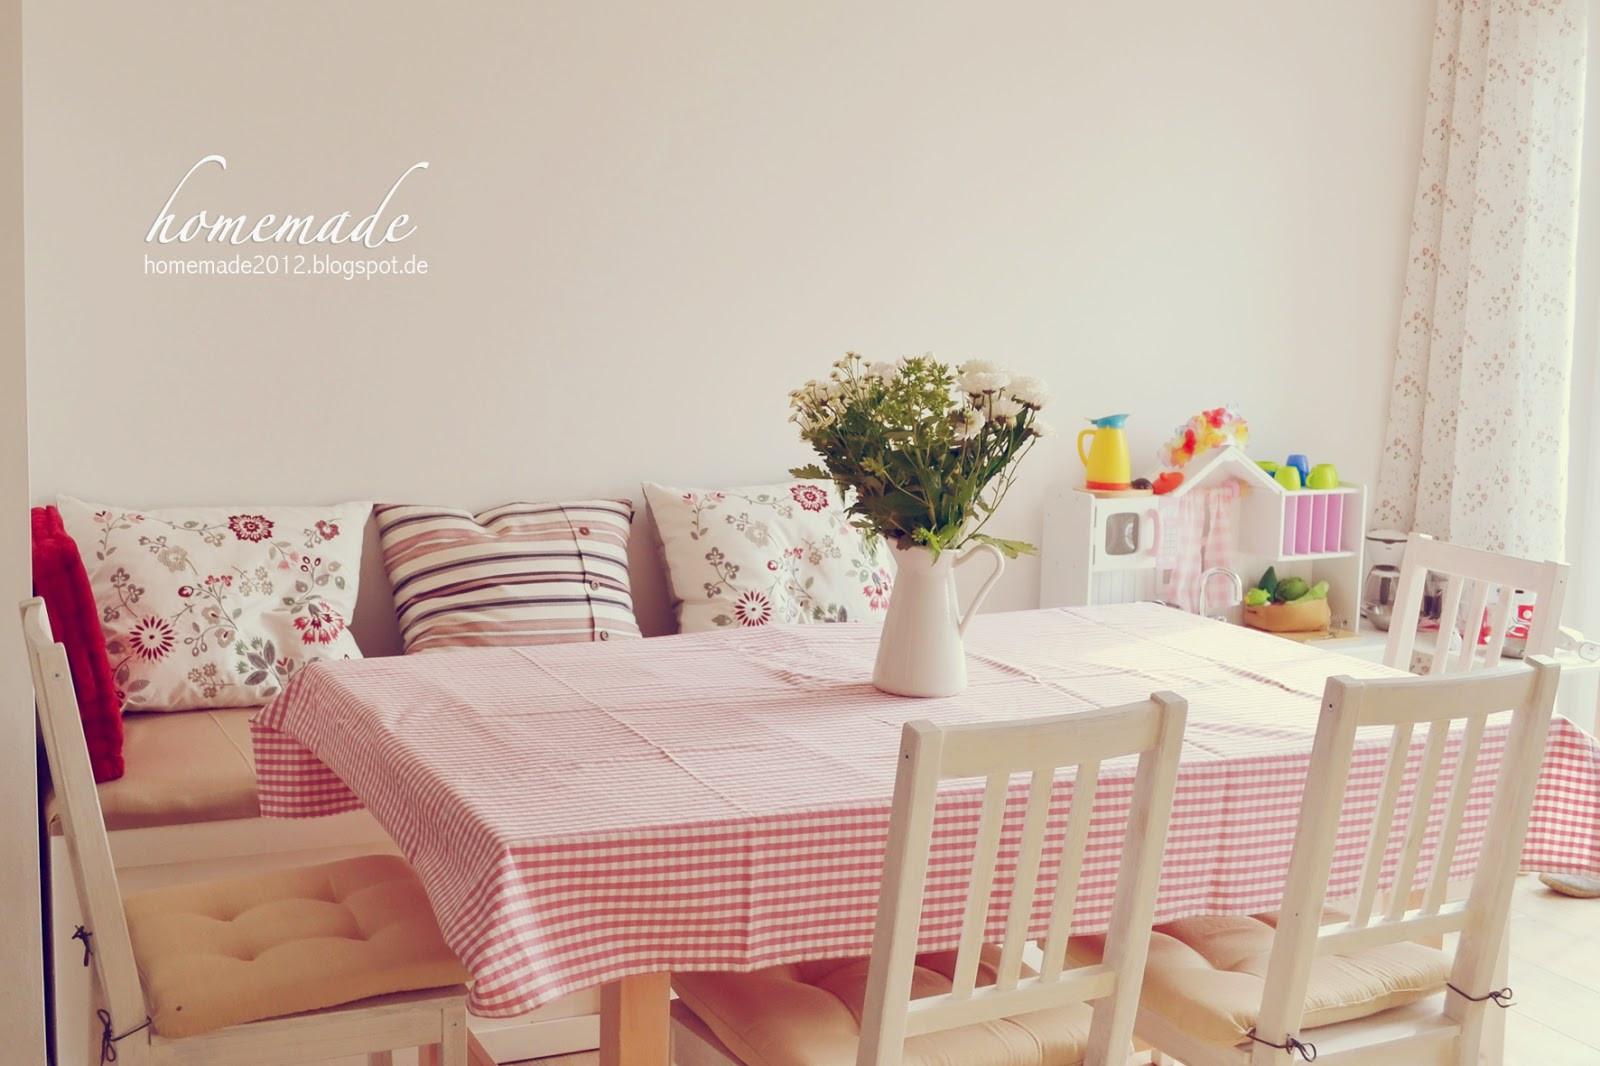 Sitzbank Diy  homemade ♥ Sitzbank DIY